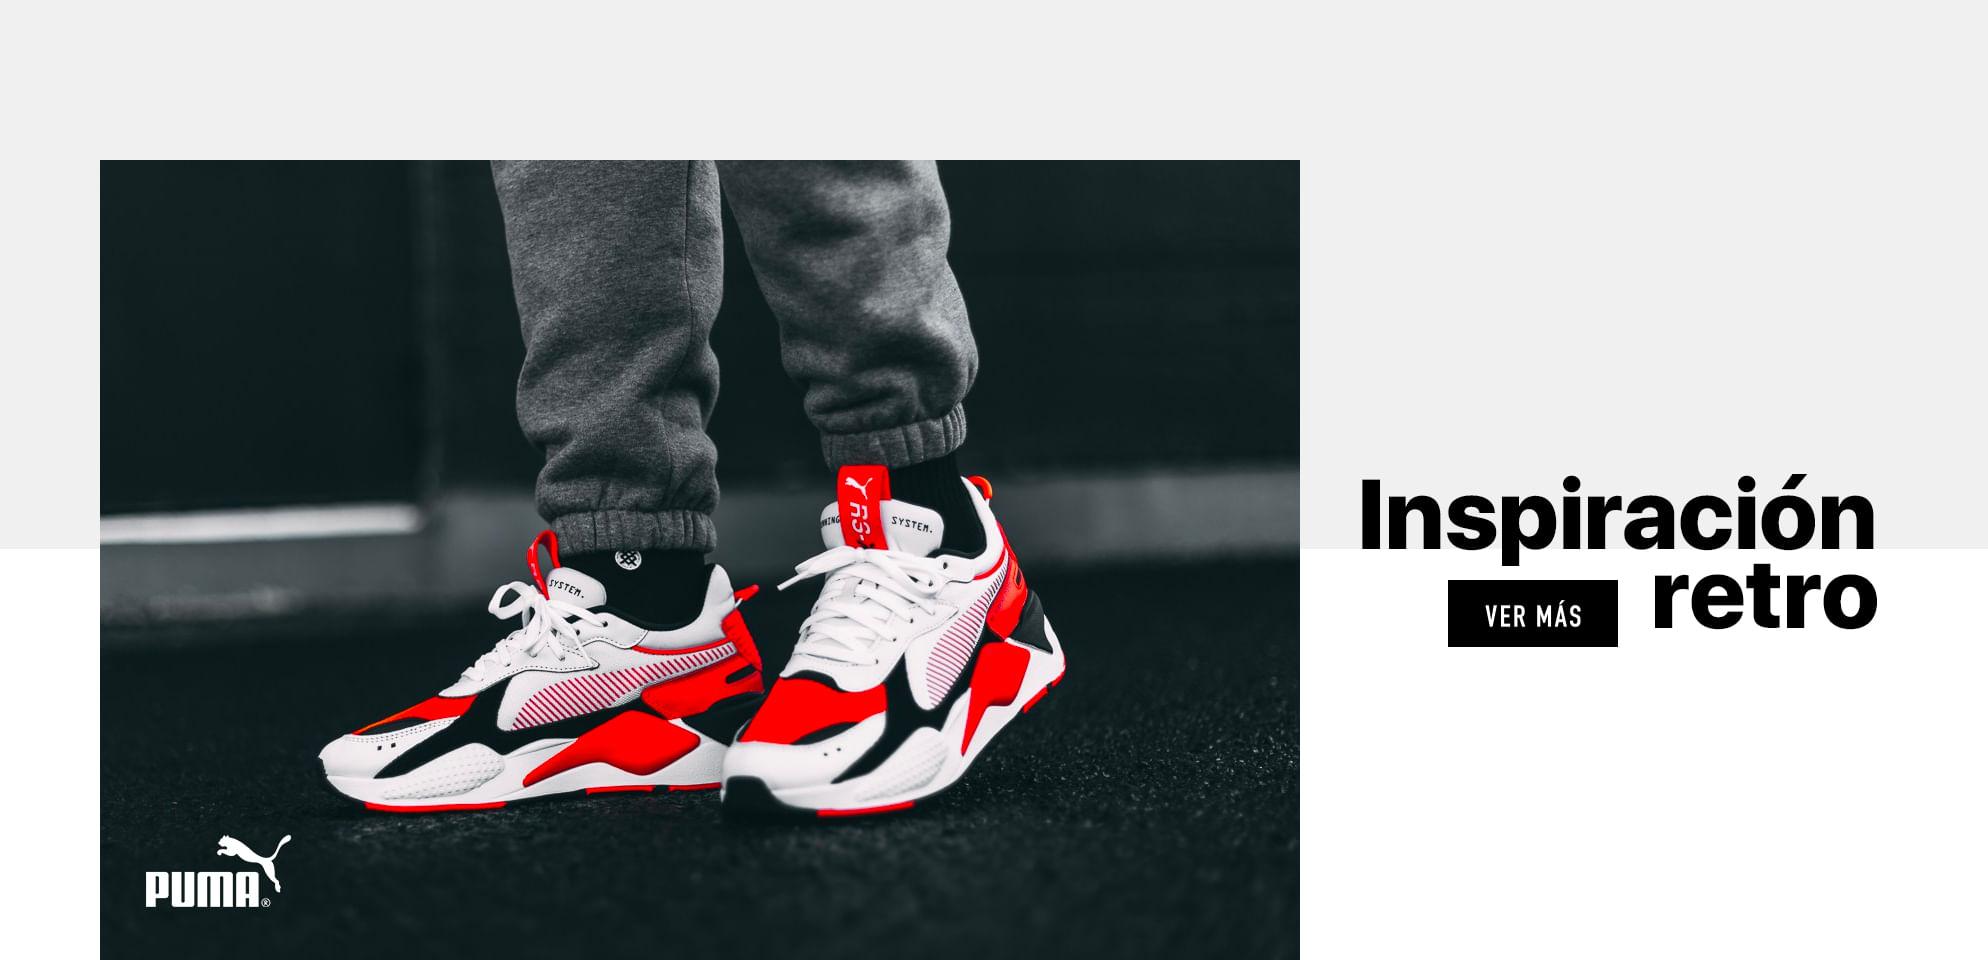 e52e934ad FERRATO. Tienda Online. Zapatos, Ropa y Accesorios